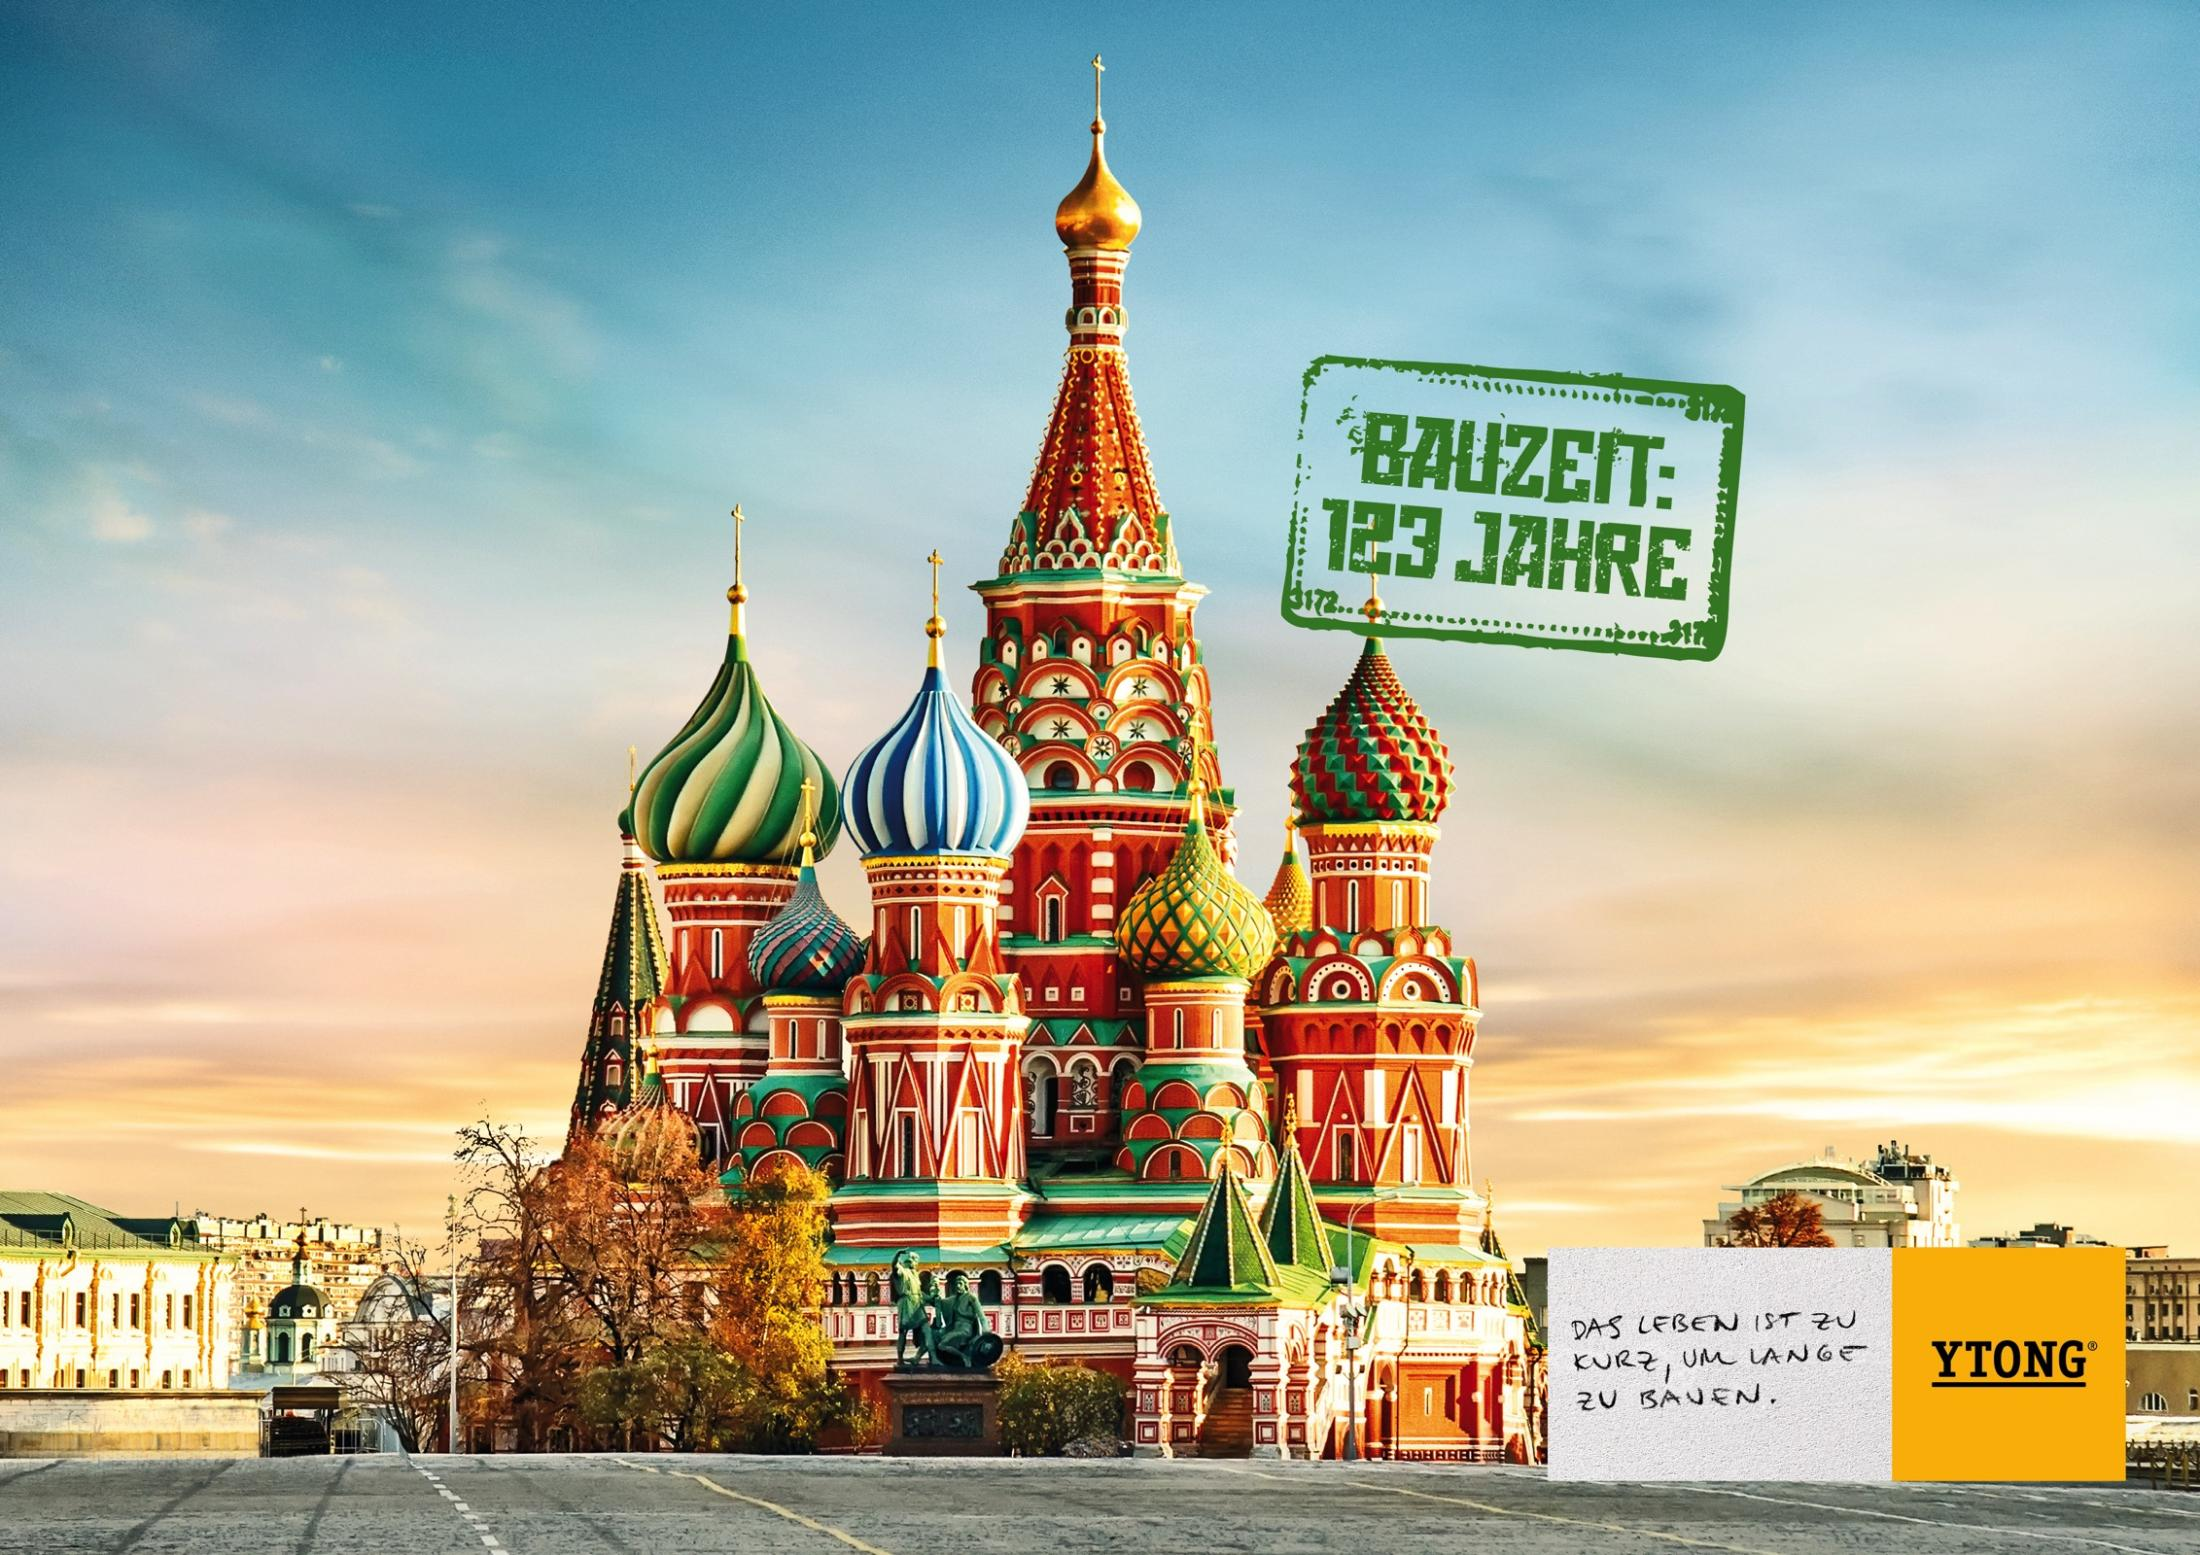 Xella Print Ad - Building Times – Kremlin